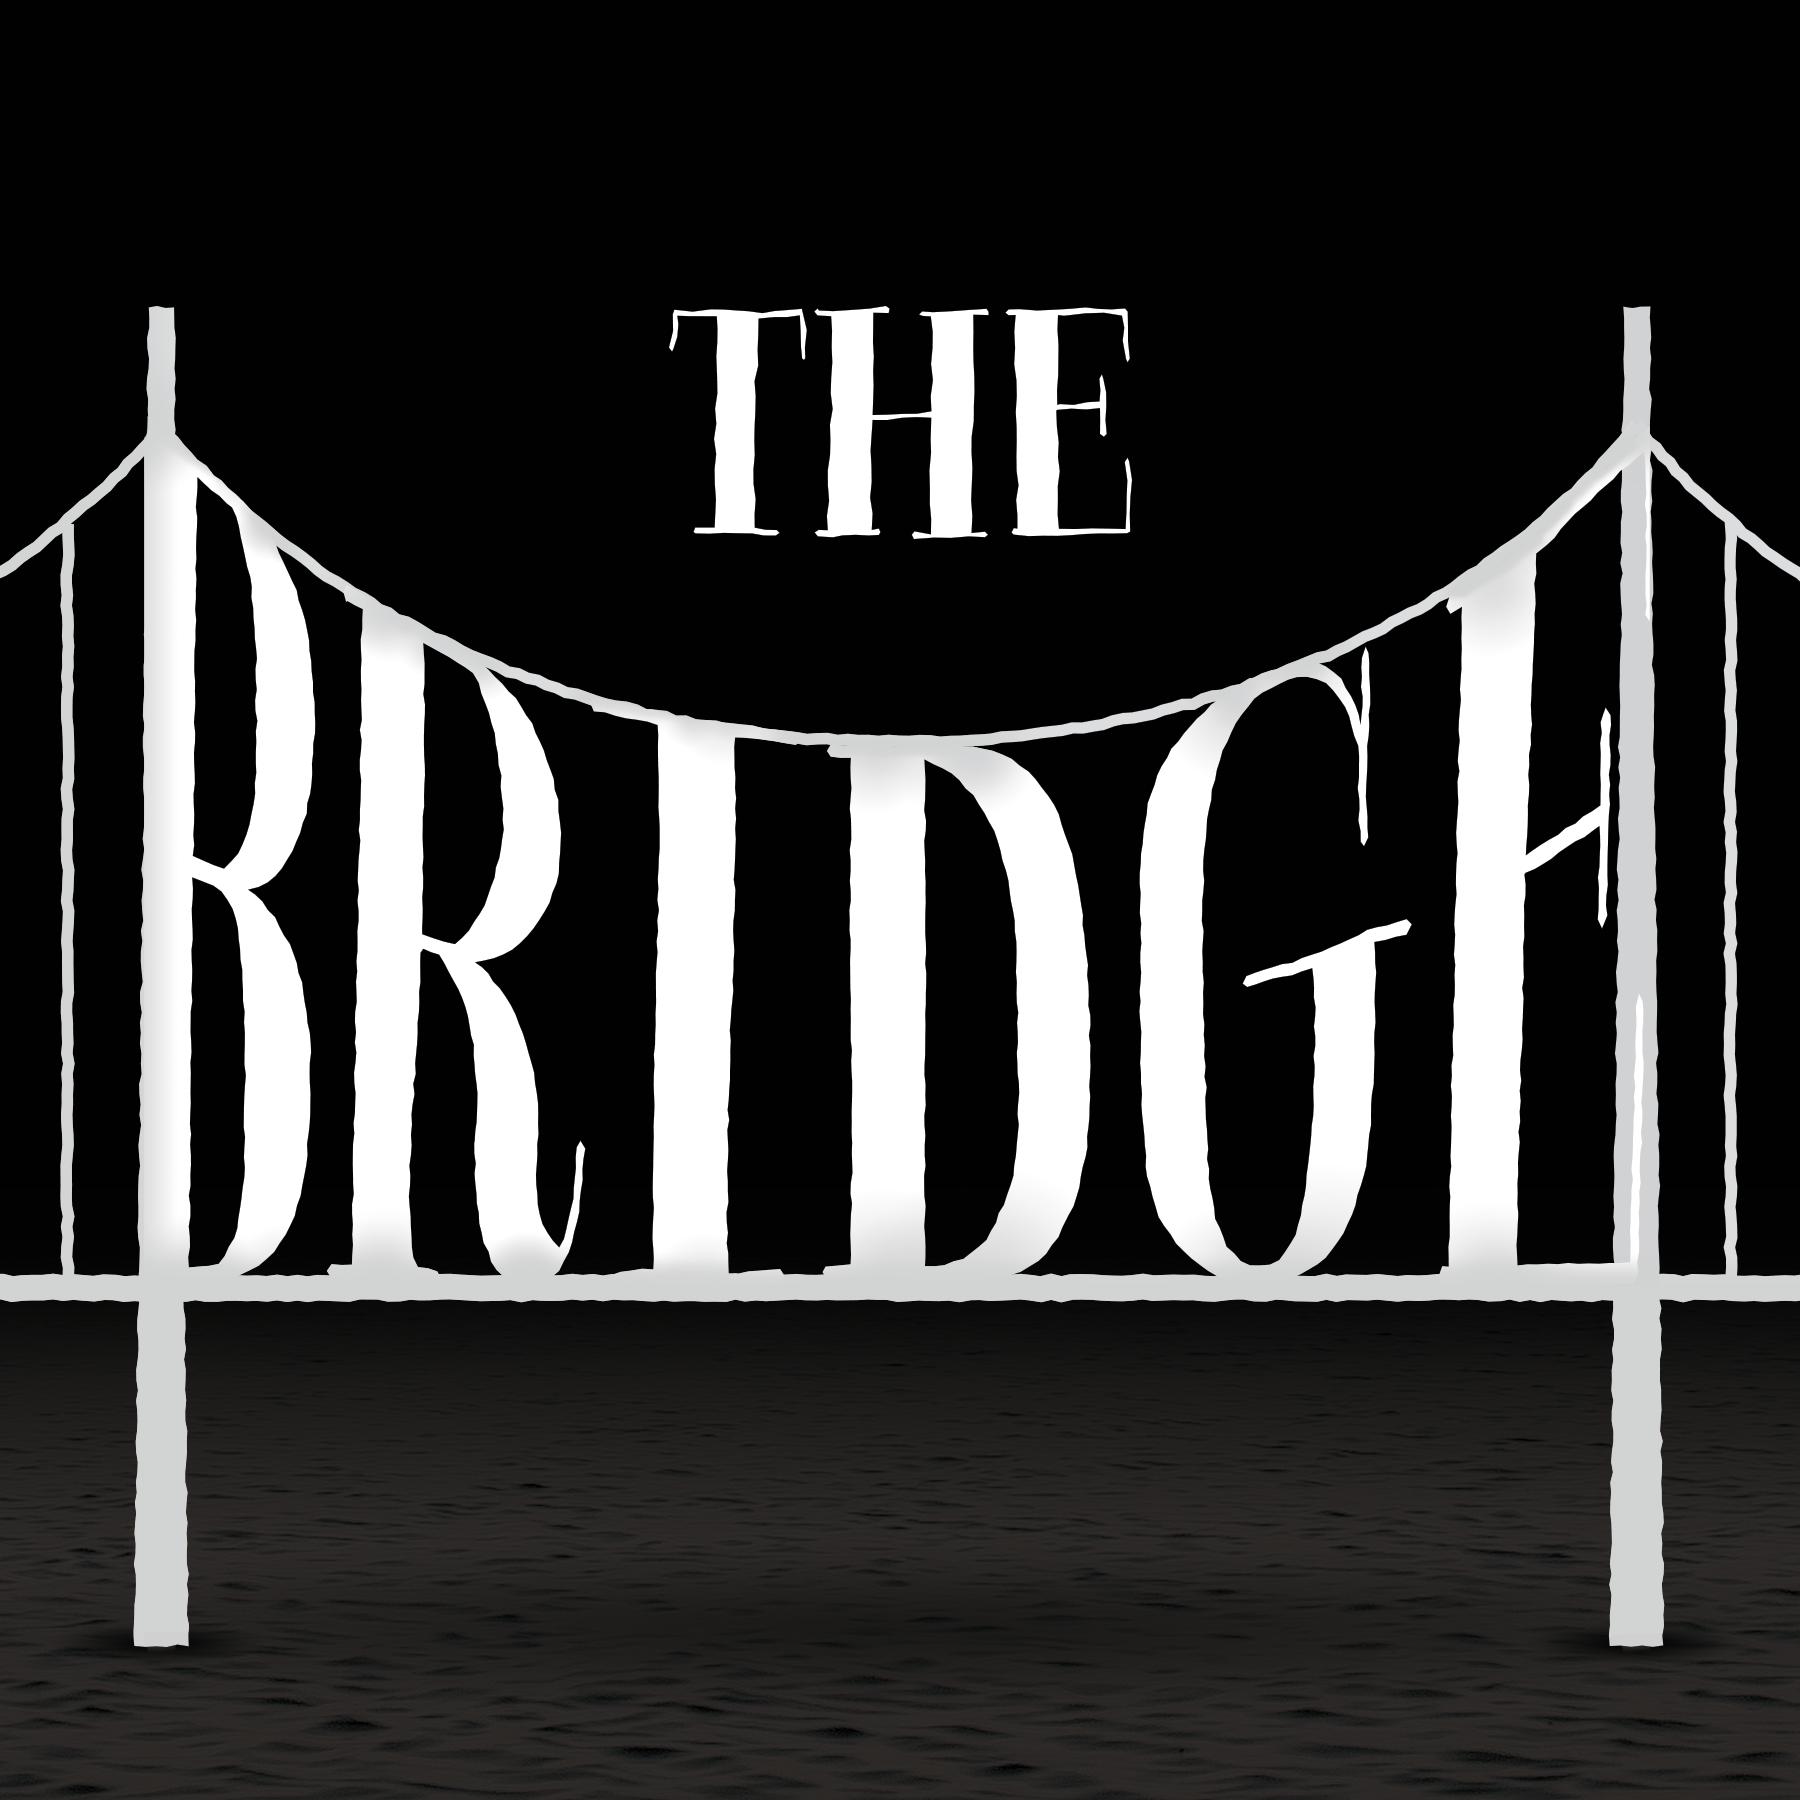 the bridge - An audio drama podcast about a spooky bridge.